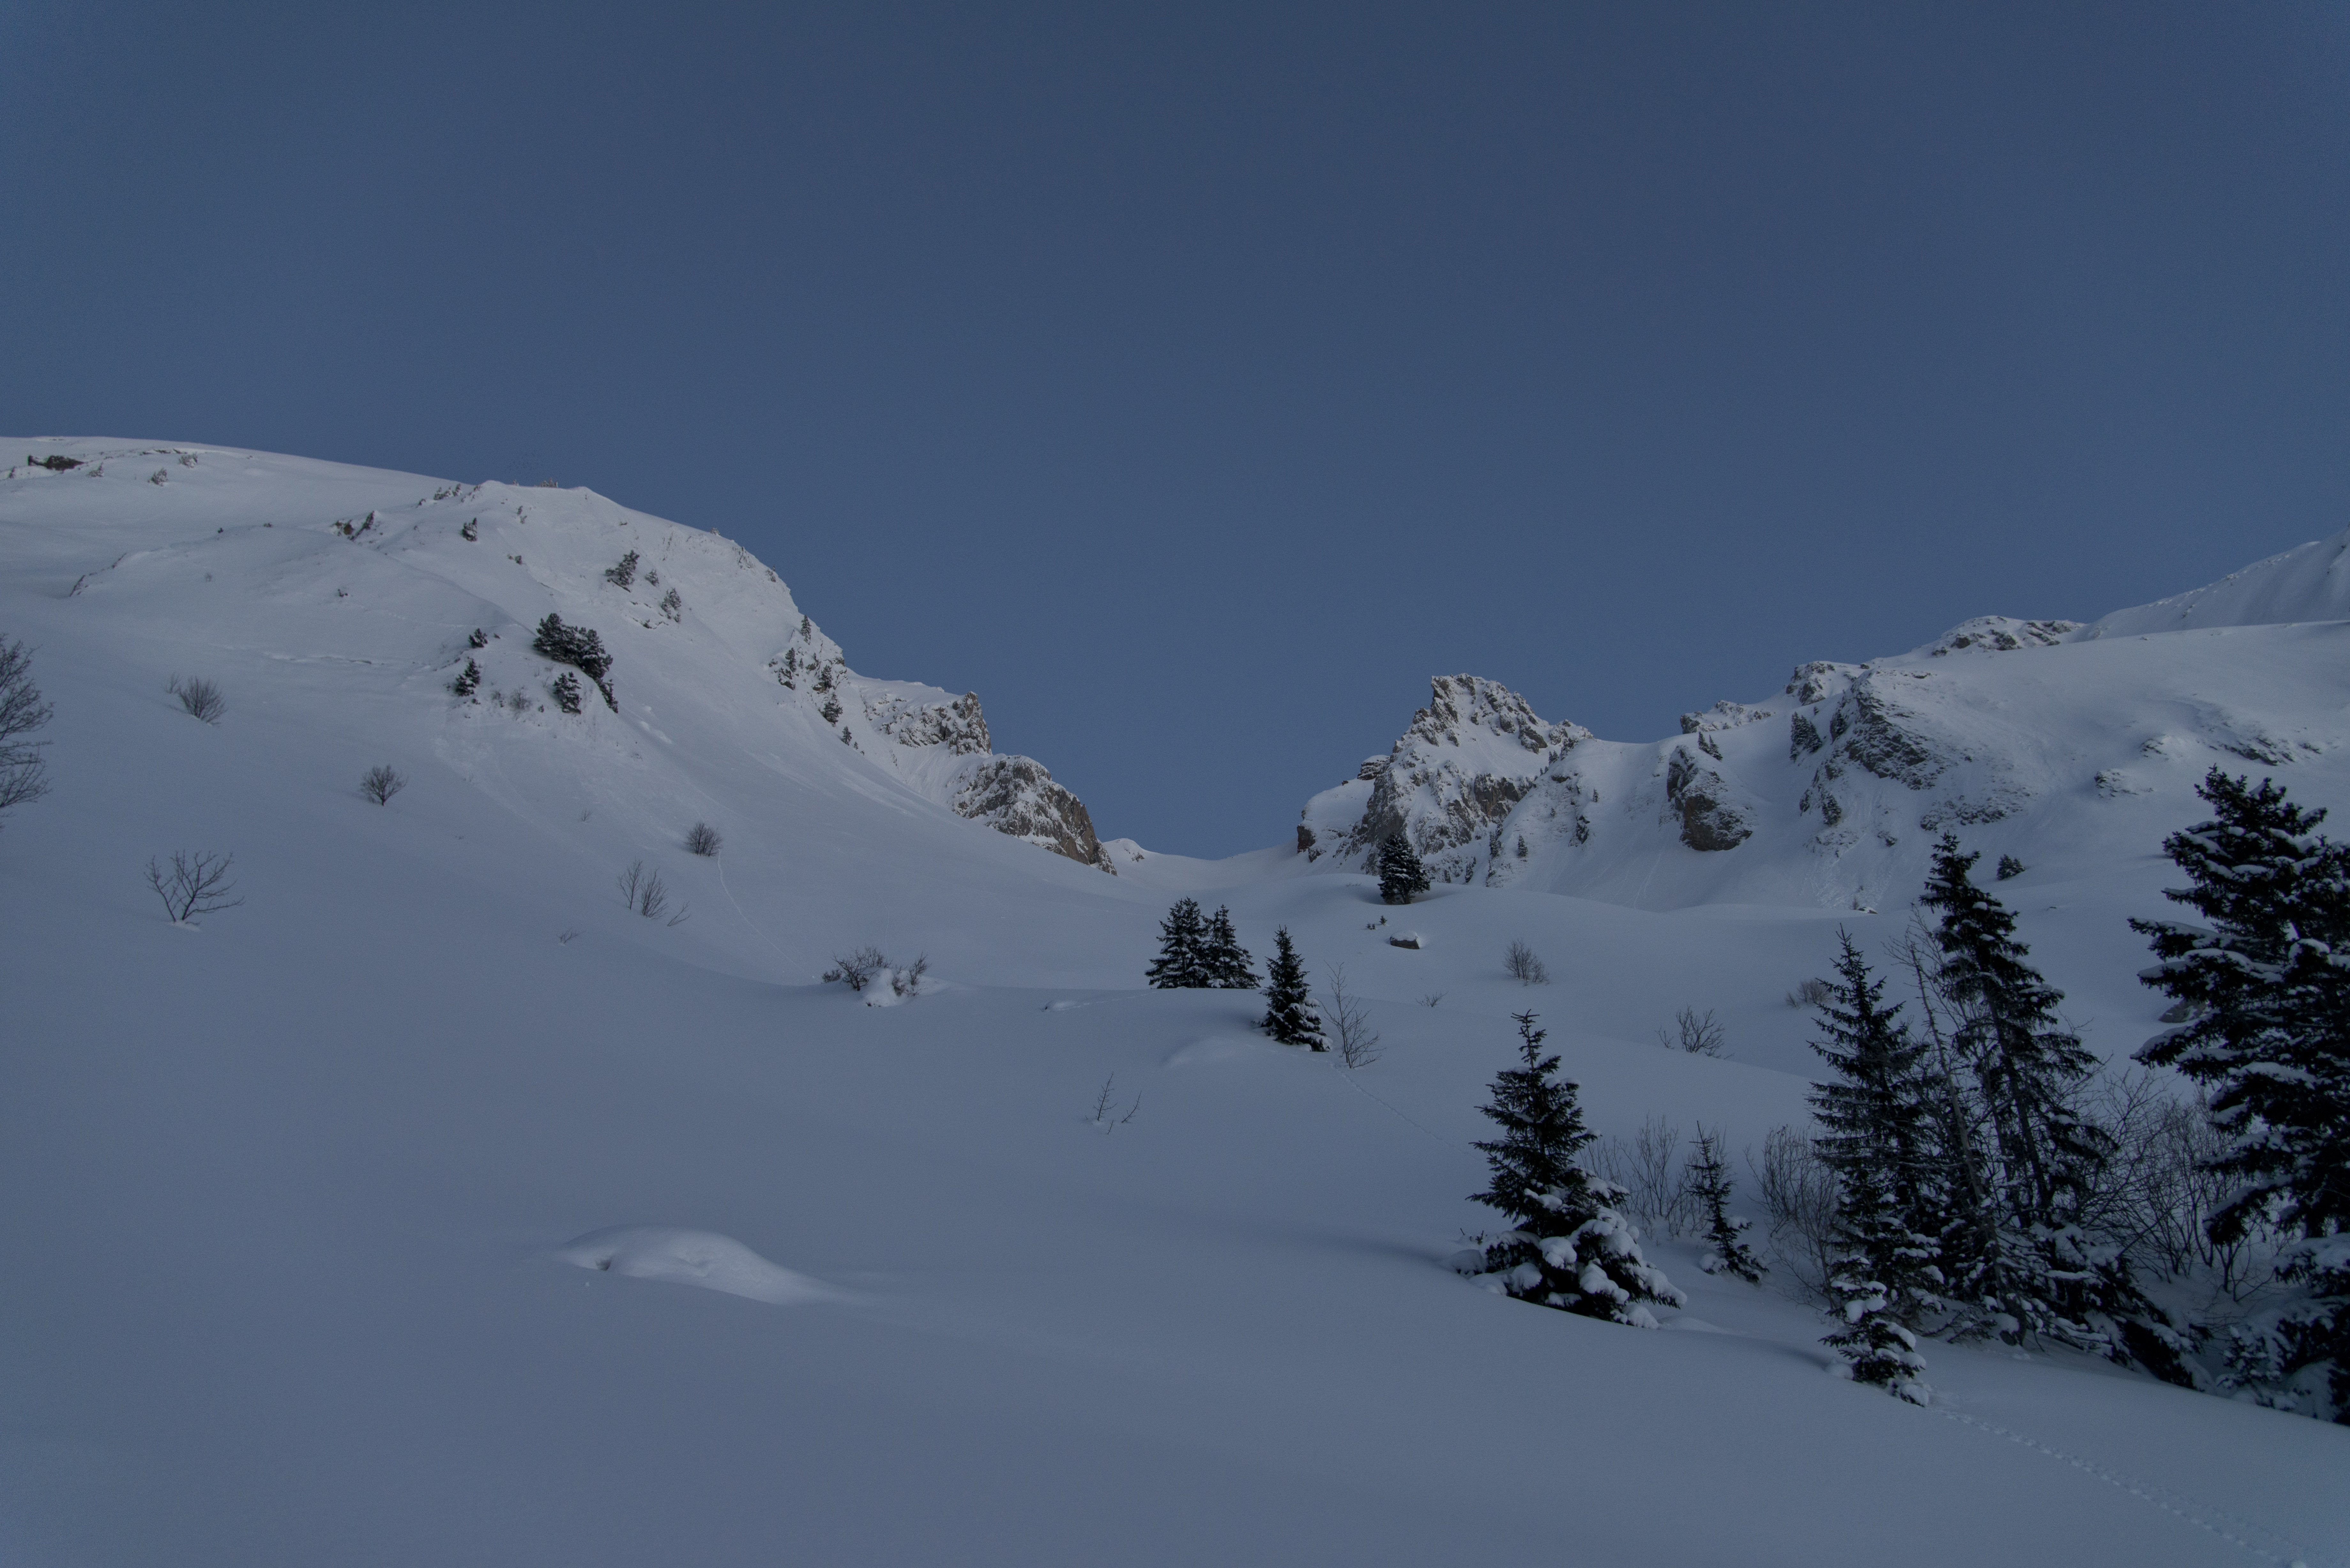 2013-02-10 Col de Chaudin